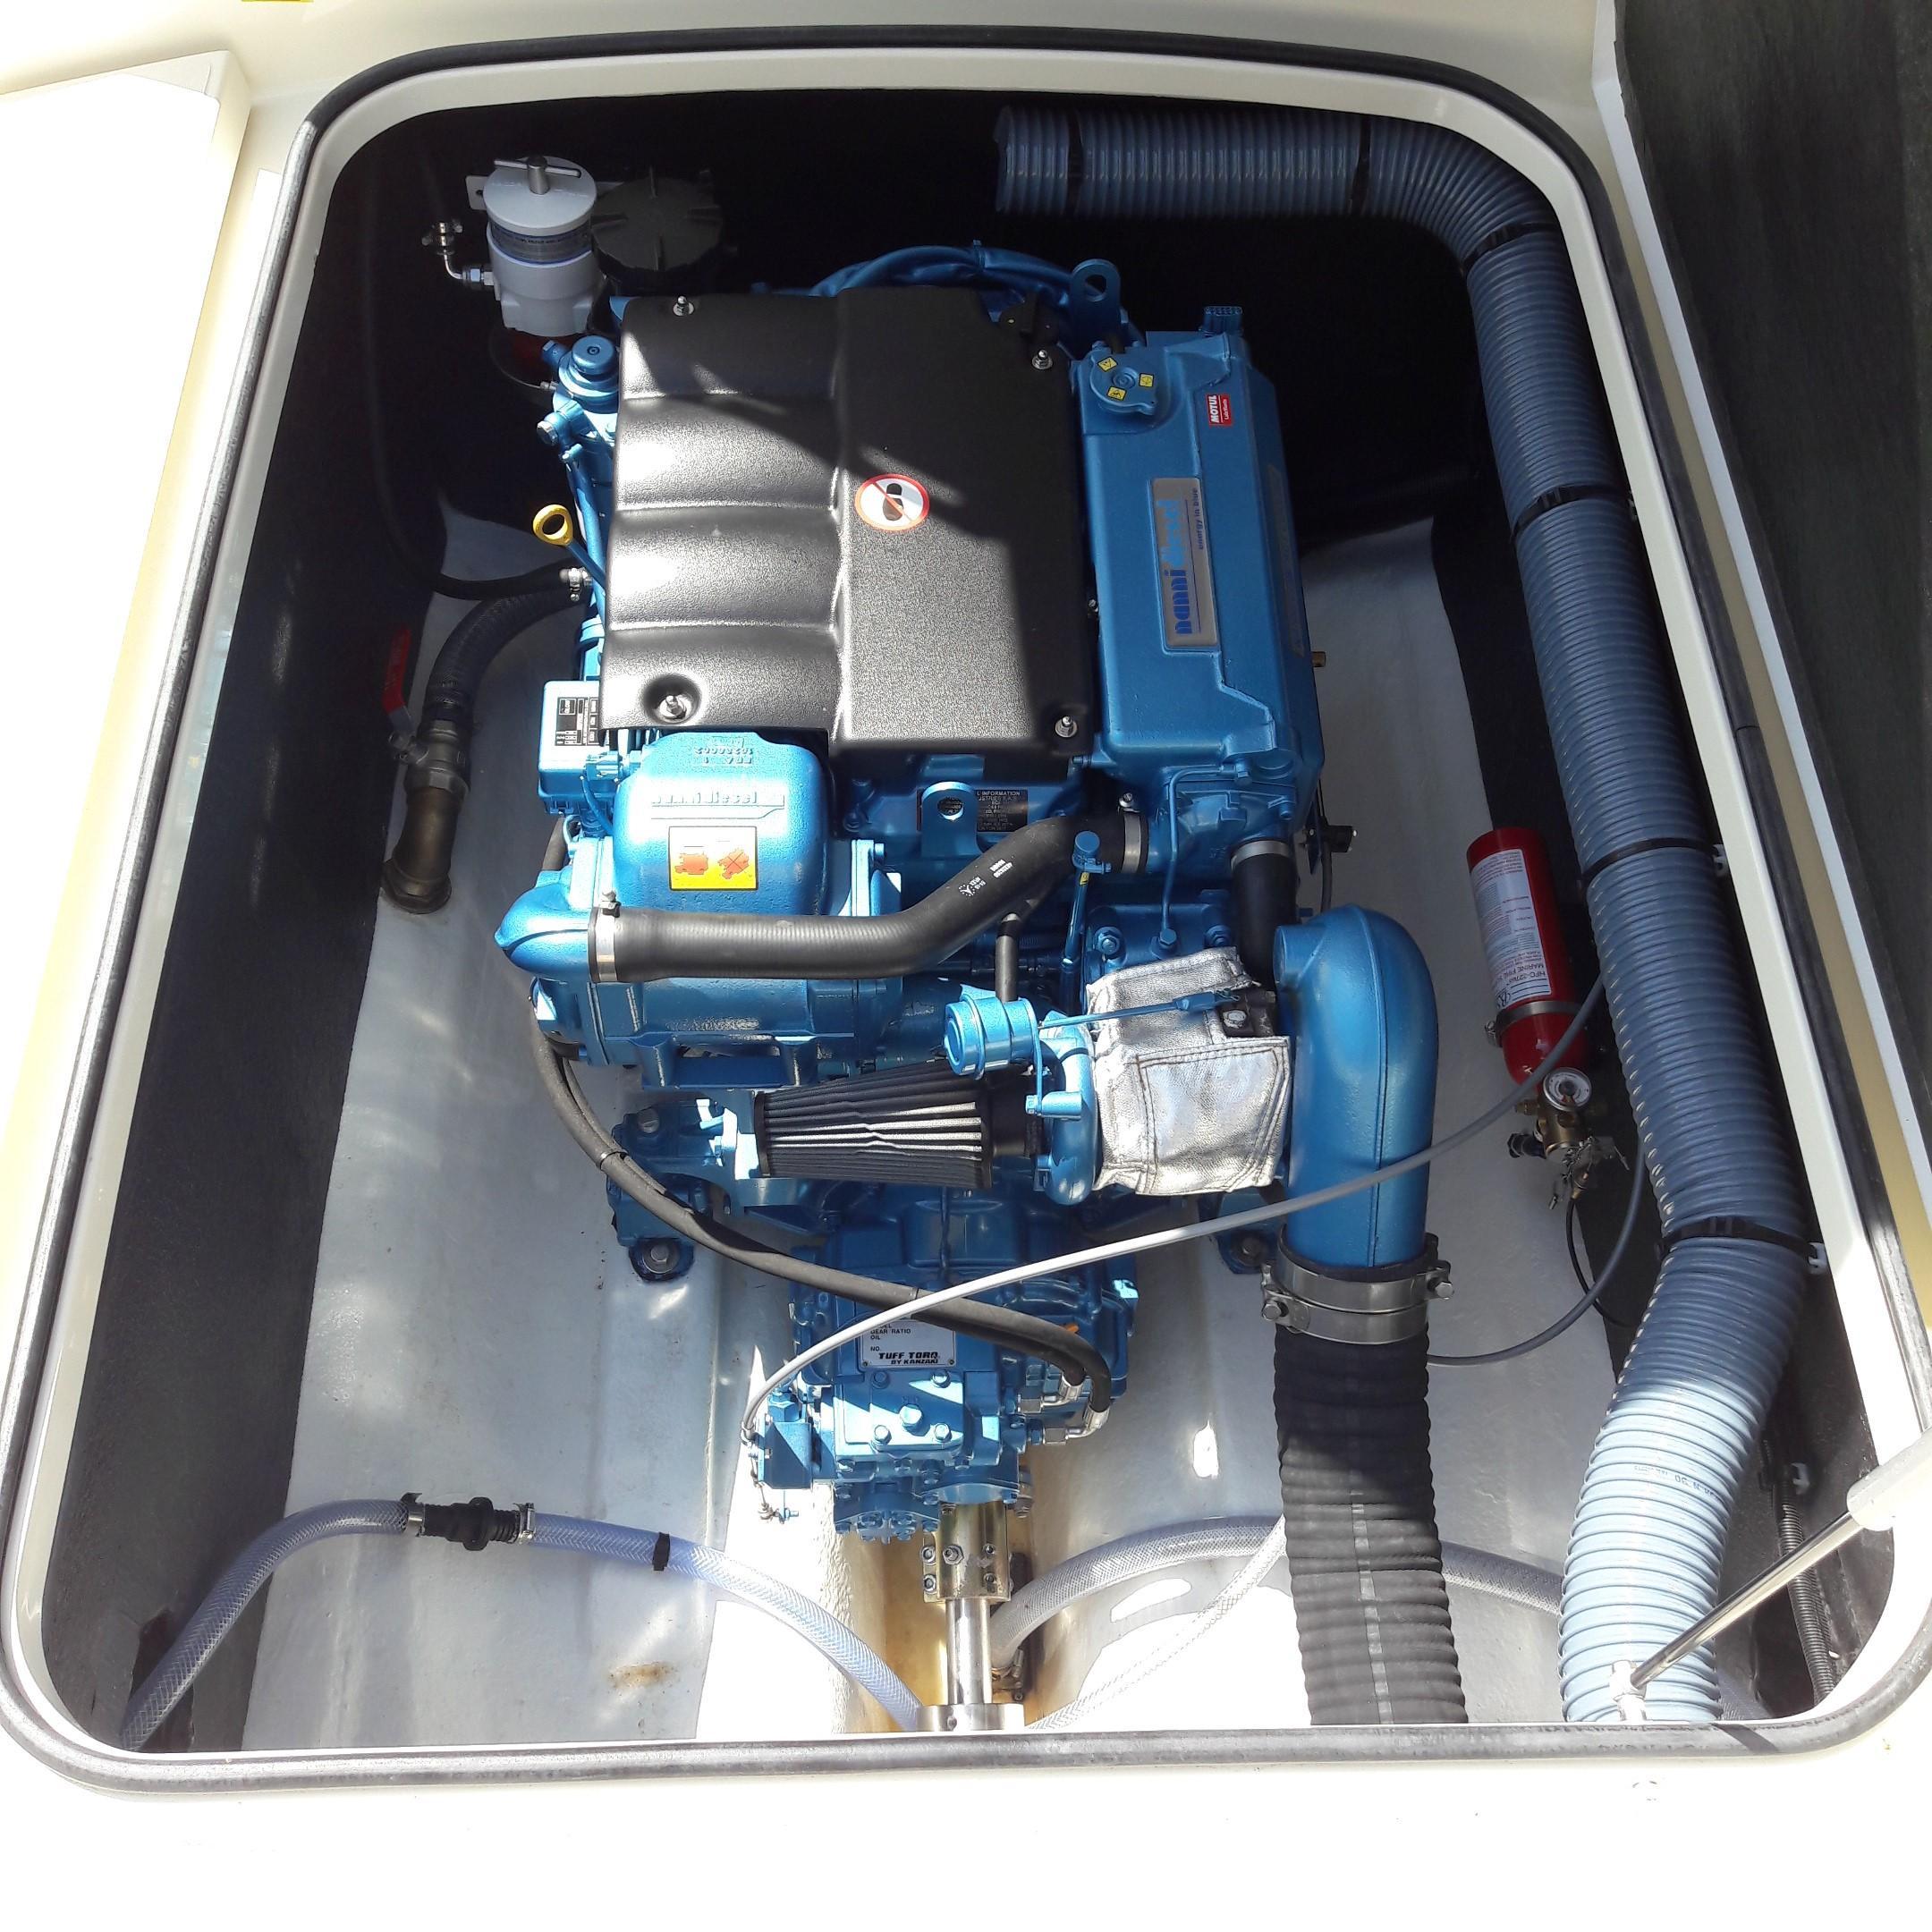 Rhea 730 Timonier - engine installation